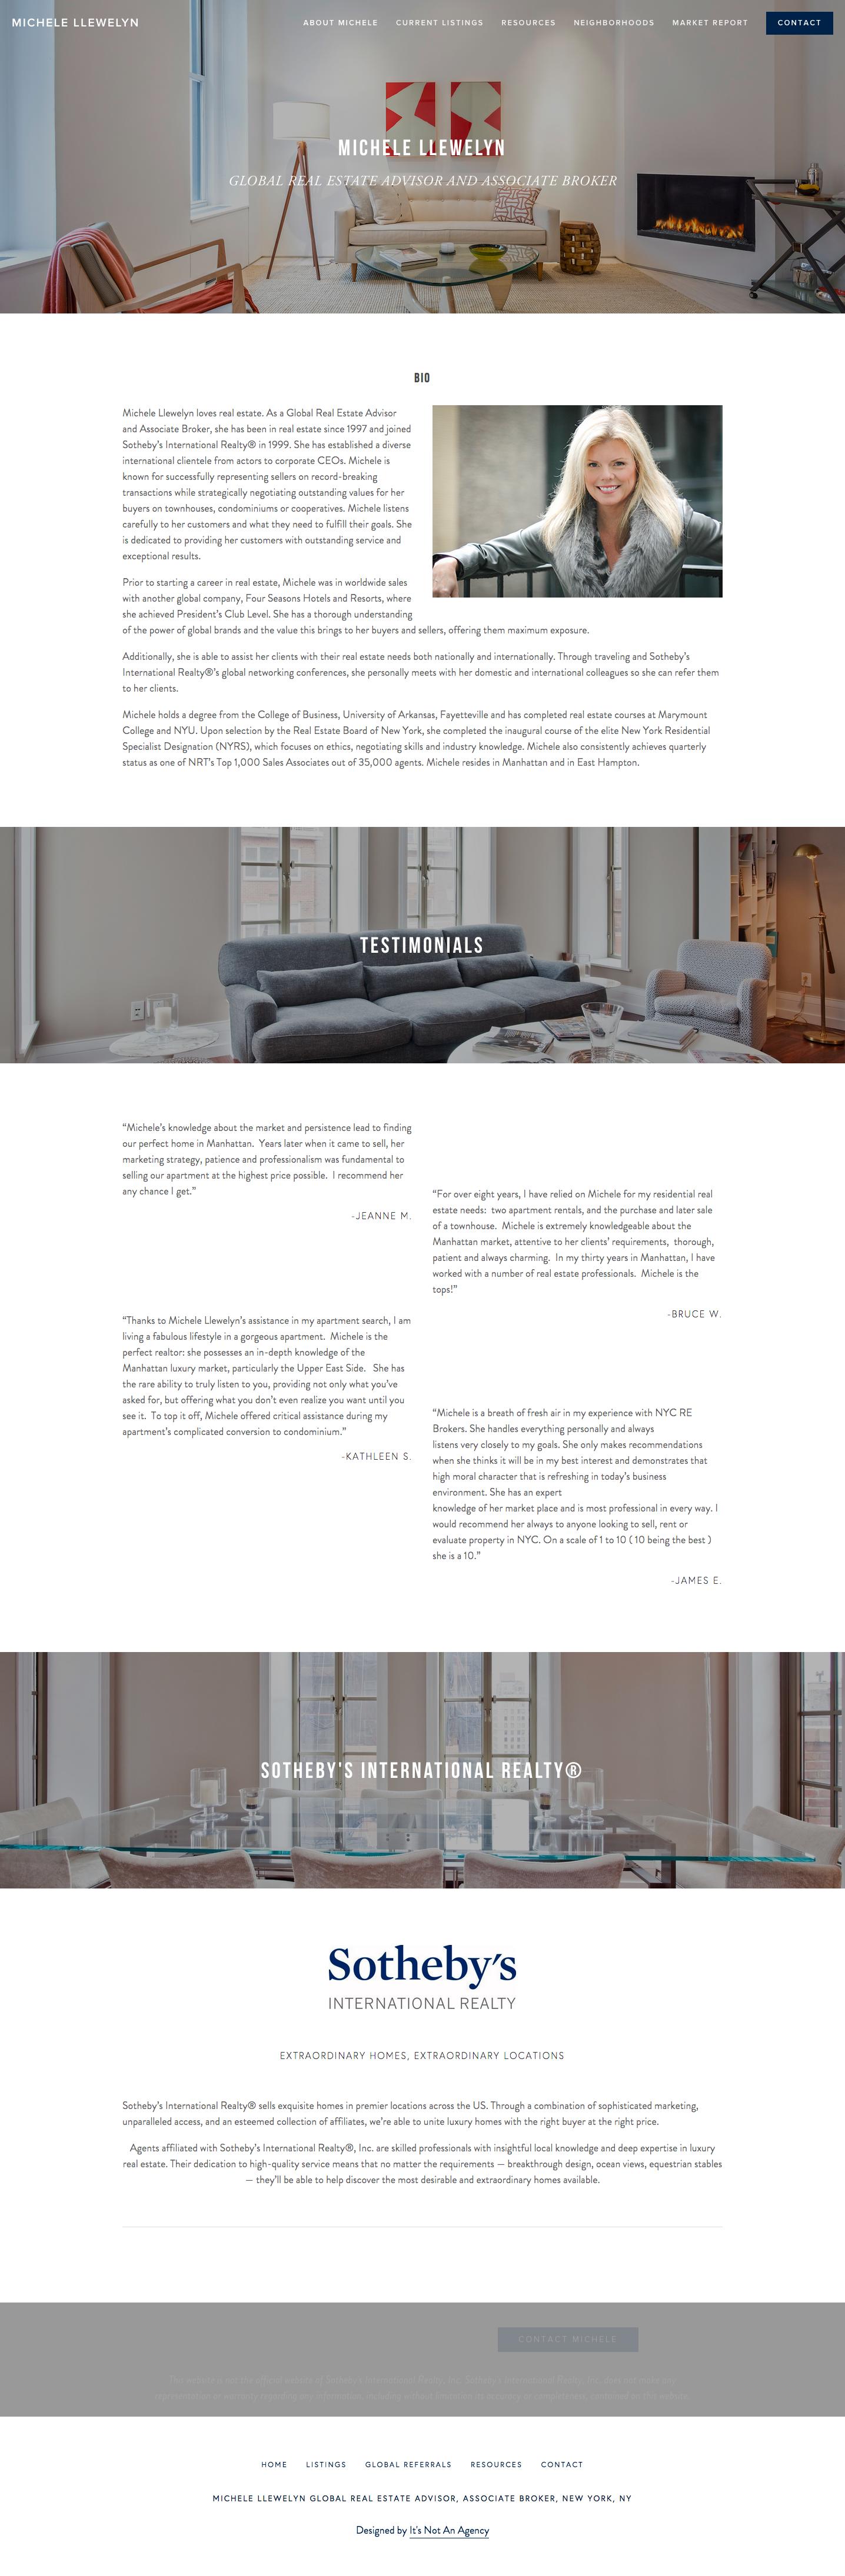 Real Estate Website_Michele Llewelyn2.png